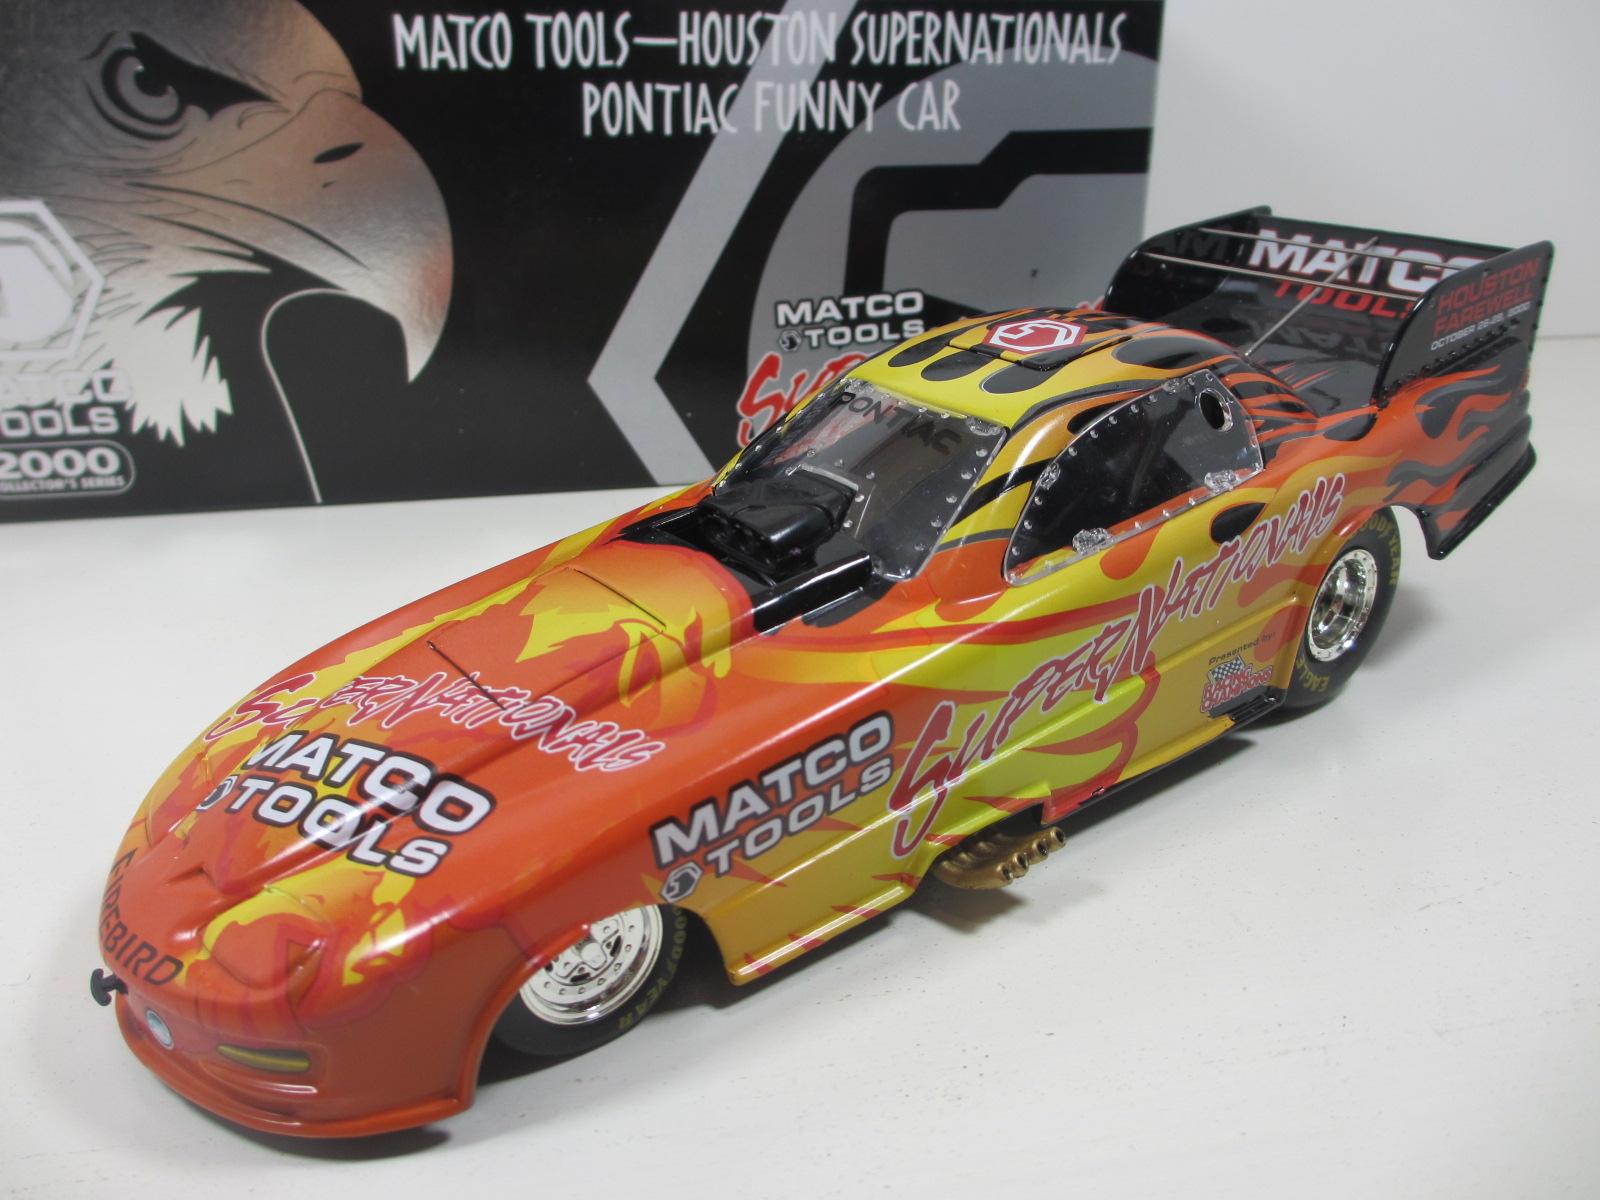 1/24 Racing Champions MATCO Tools  Funny Car  NHRA 24-126